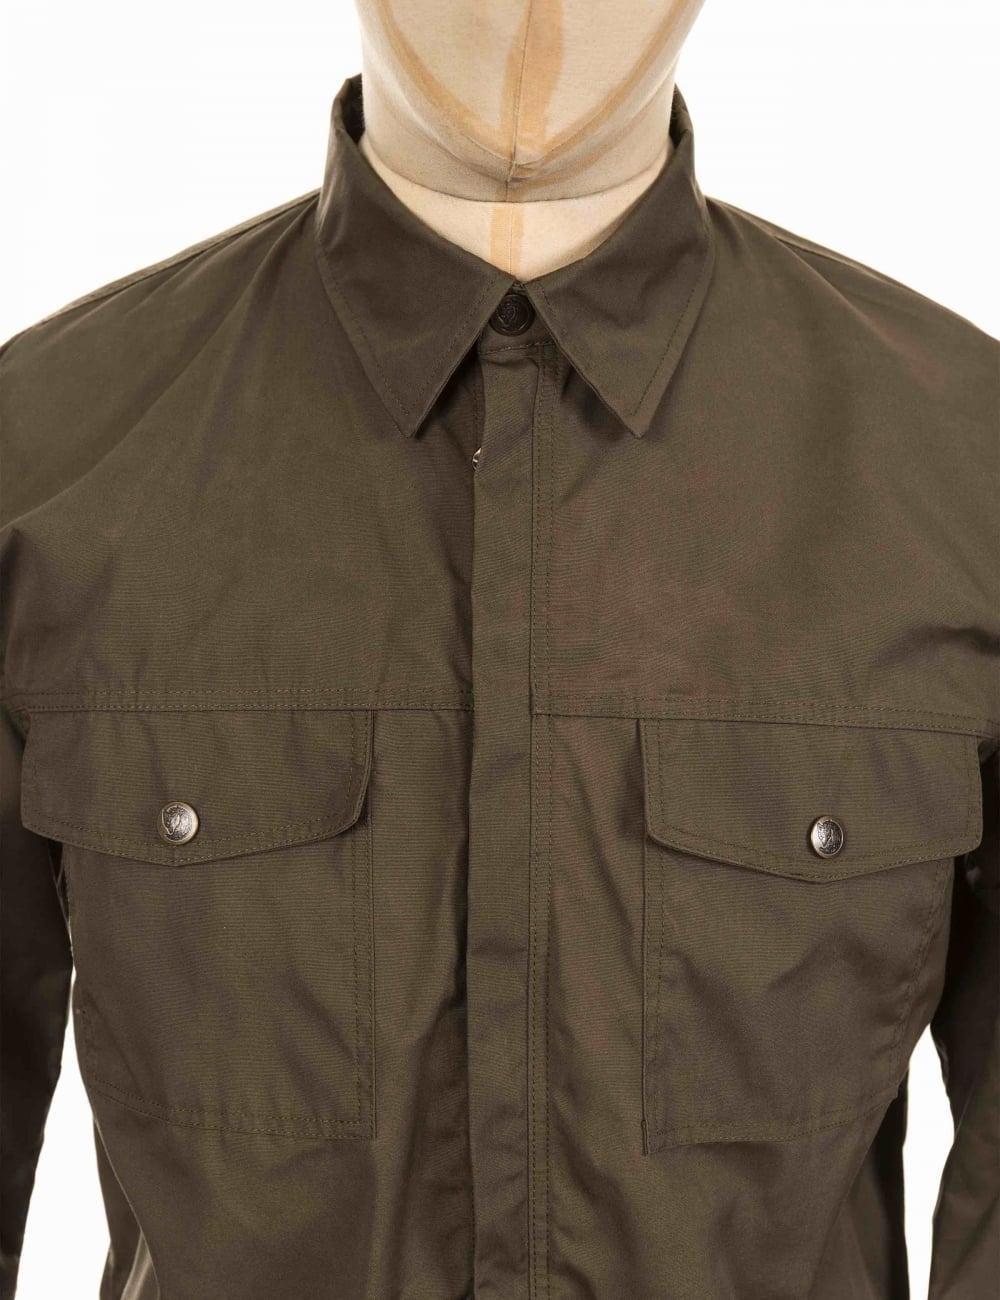 100% authentic 3a992 a1544 G-1000 Shirt - Tarmac